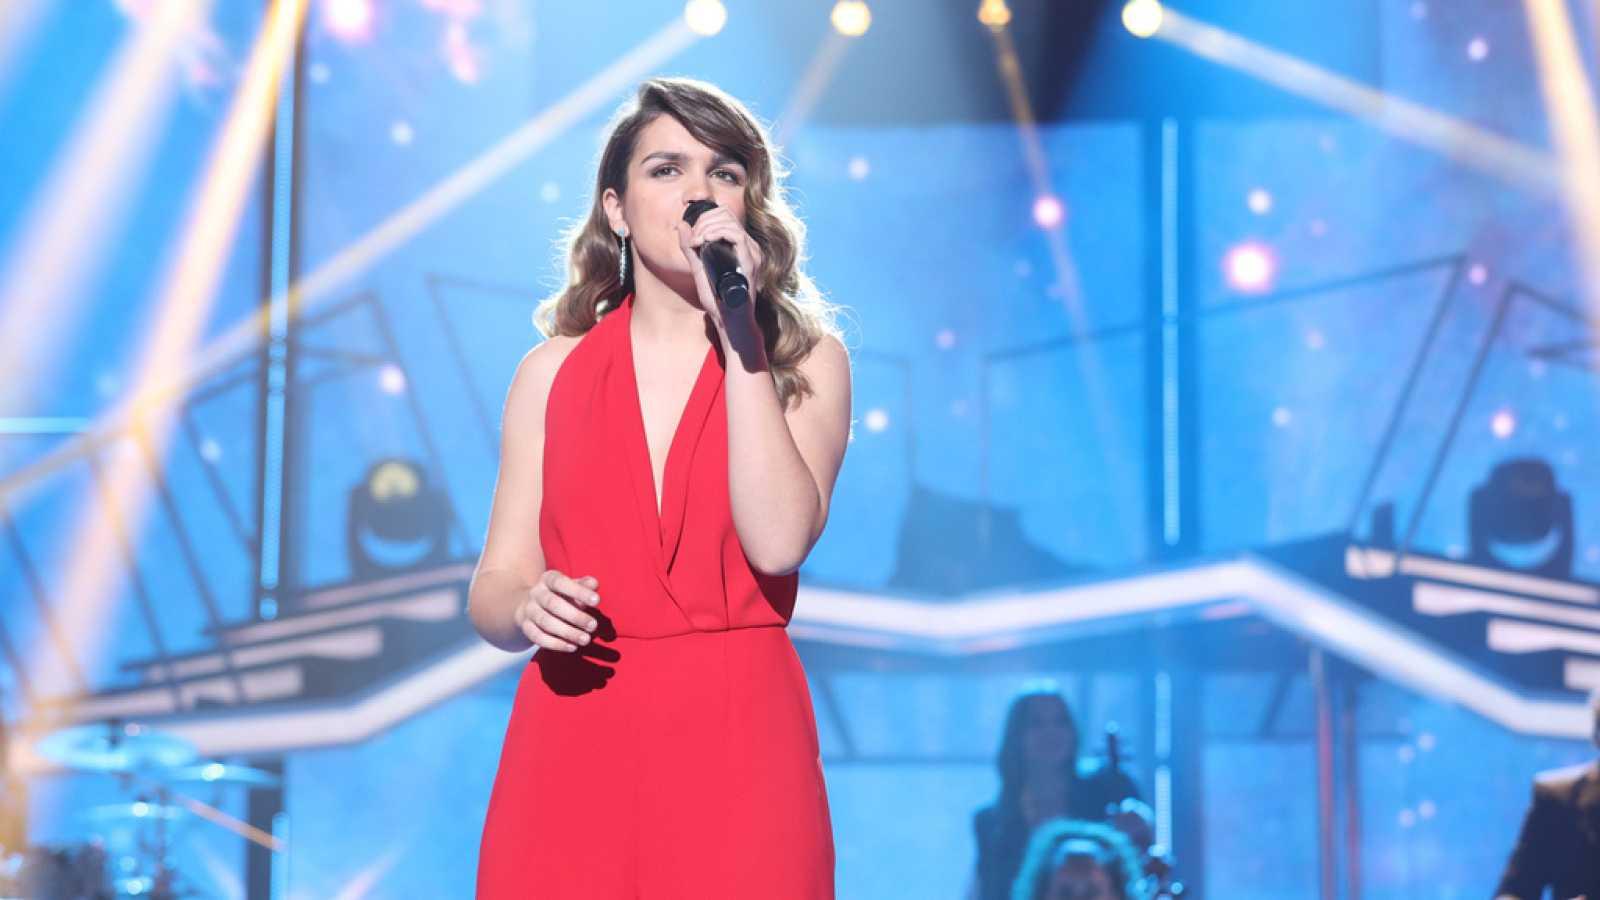 77bbc428d3 Para todos los públicos Operación Triunfo - Amaia canta  Starman  en la Gala  Final de OT reproducir video